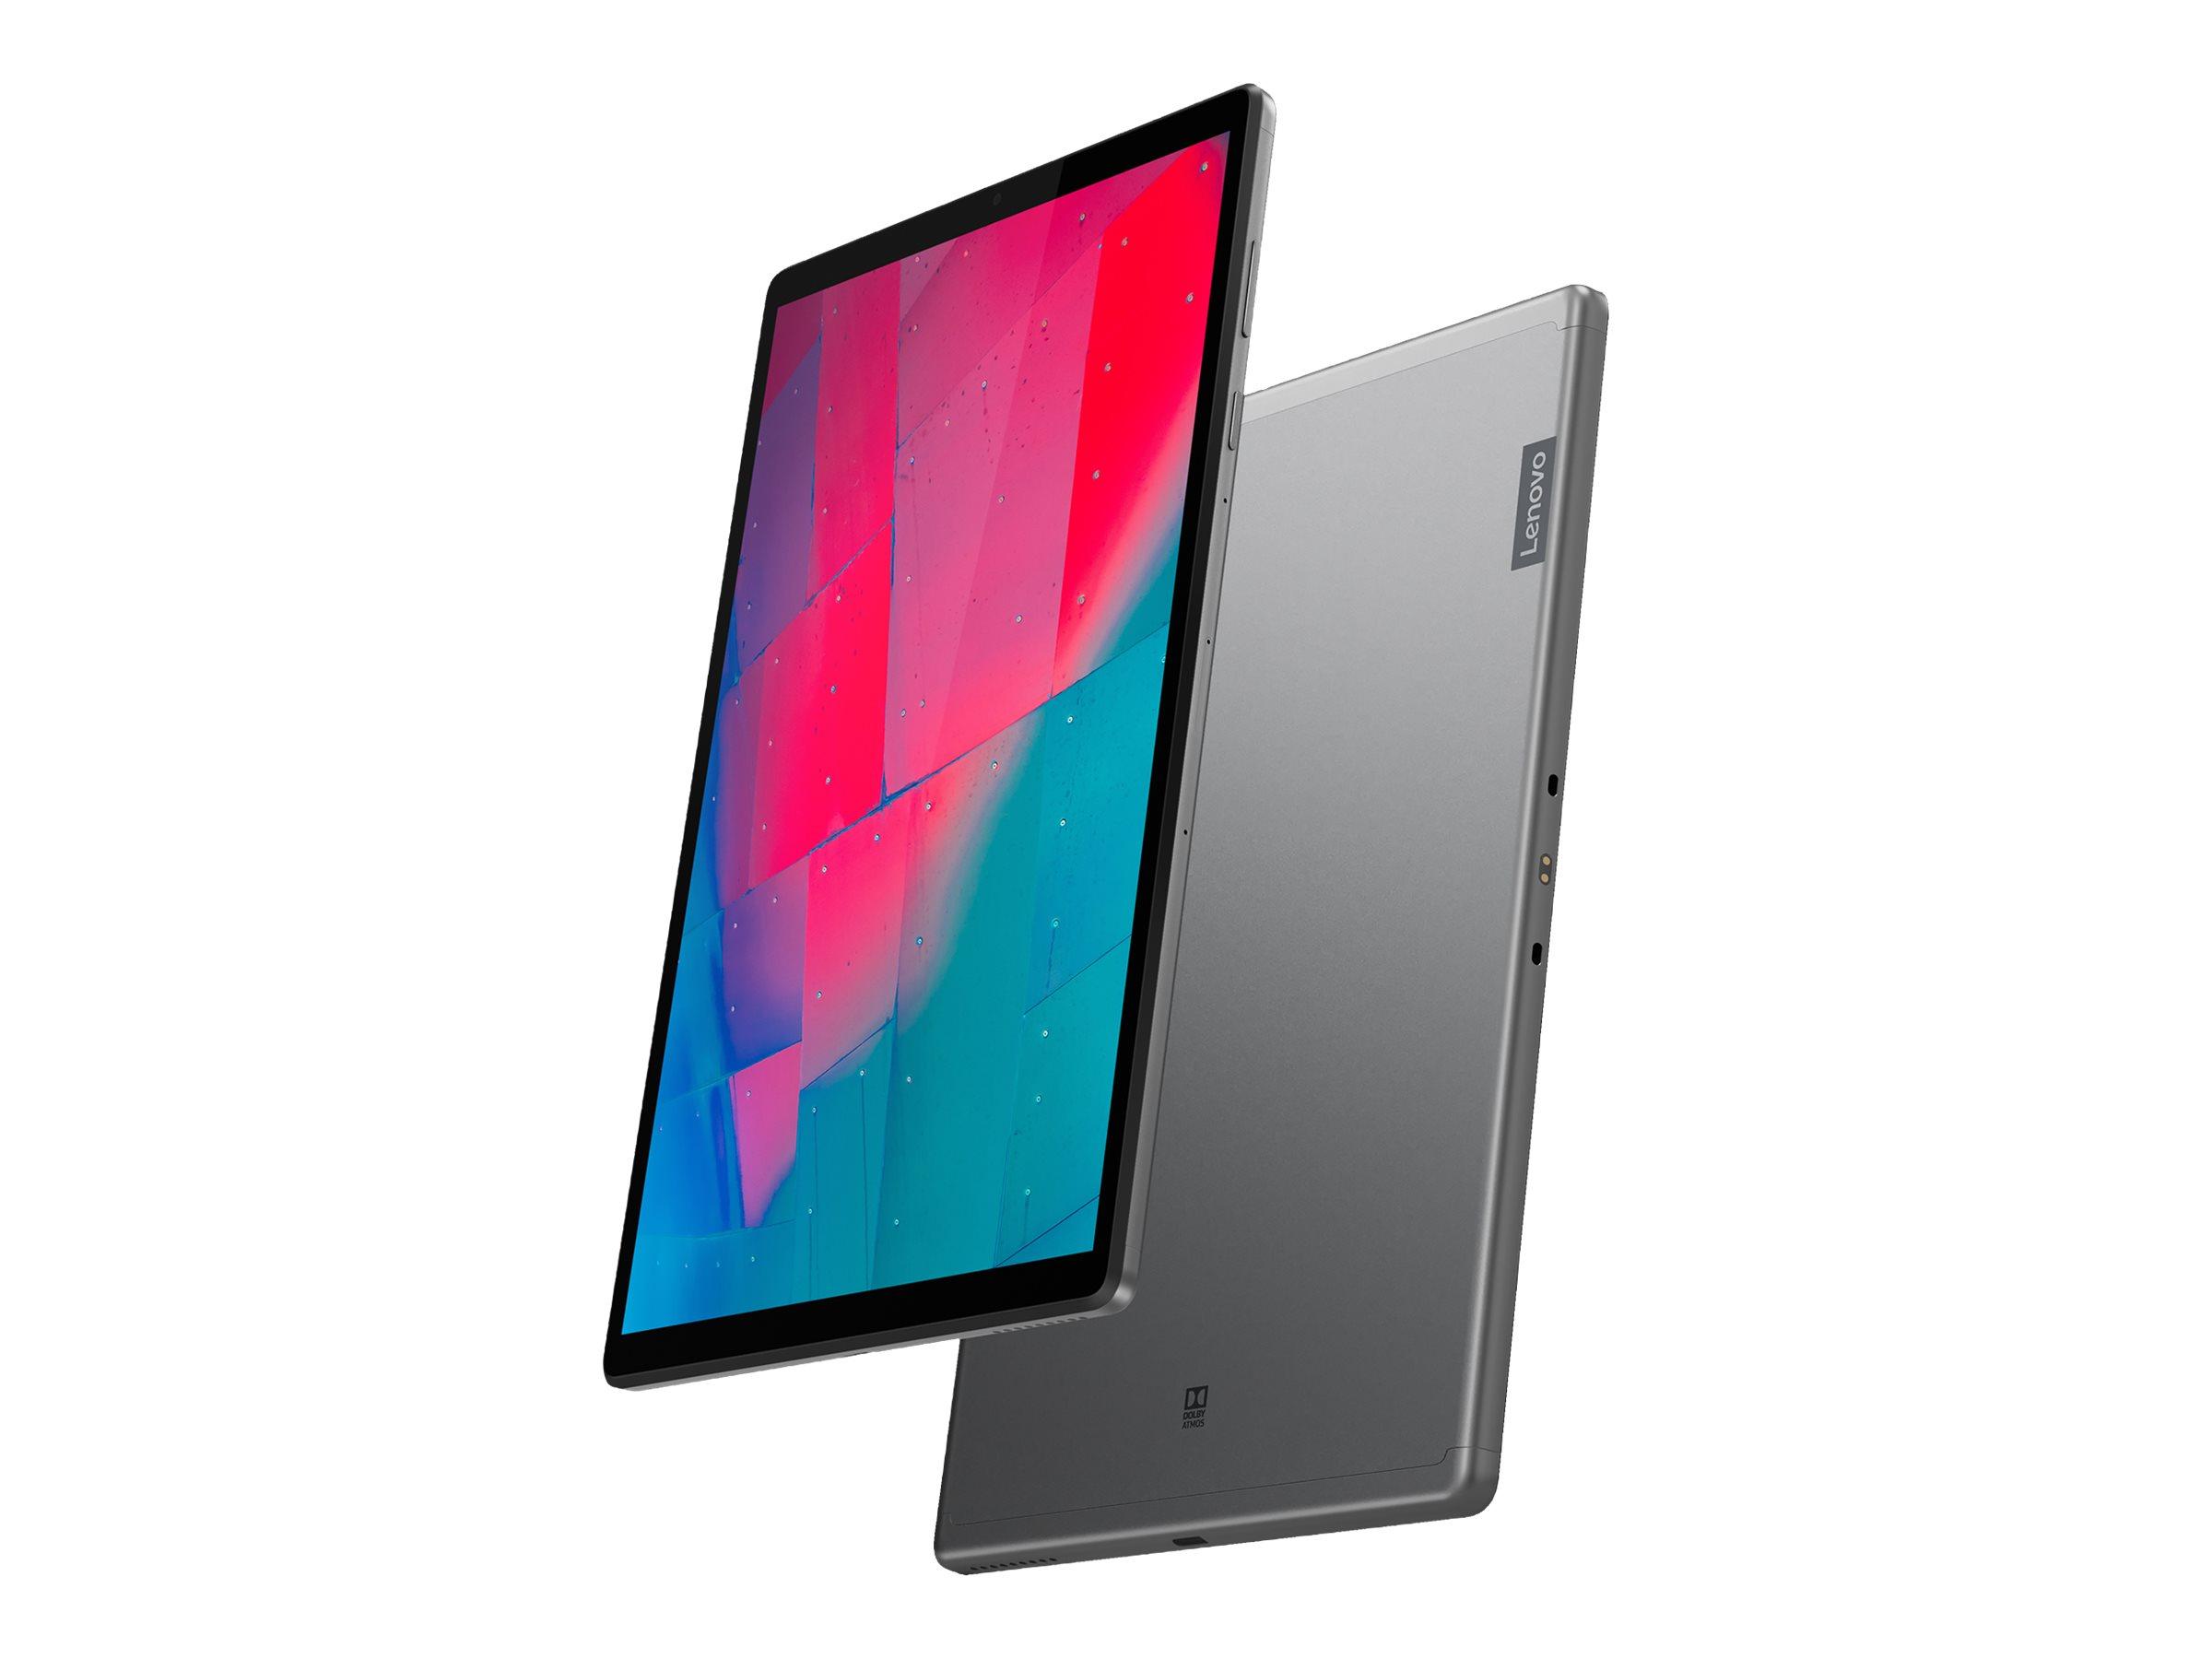 Lenovo Tab M10 FHD Plus (2nd Gen) ZA6J - Tablet - Android 9.0 (Pie)